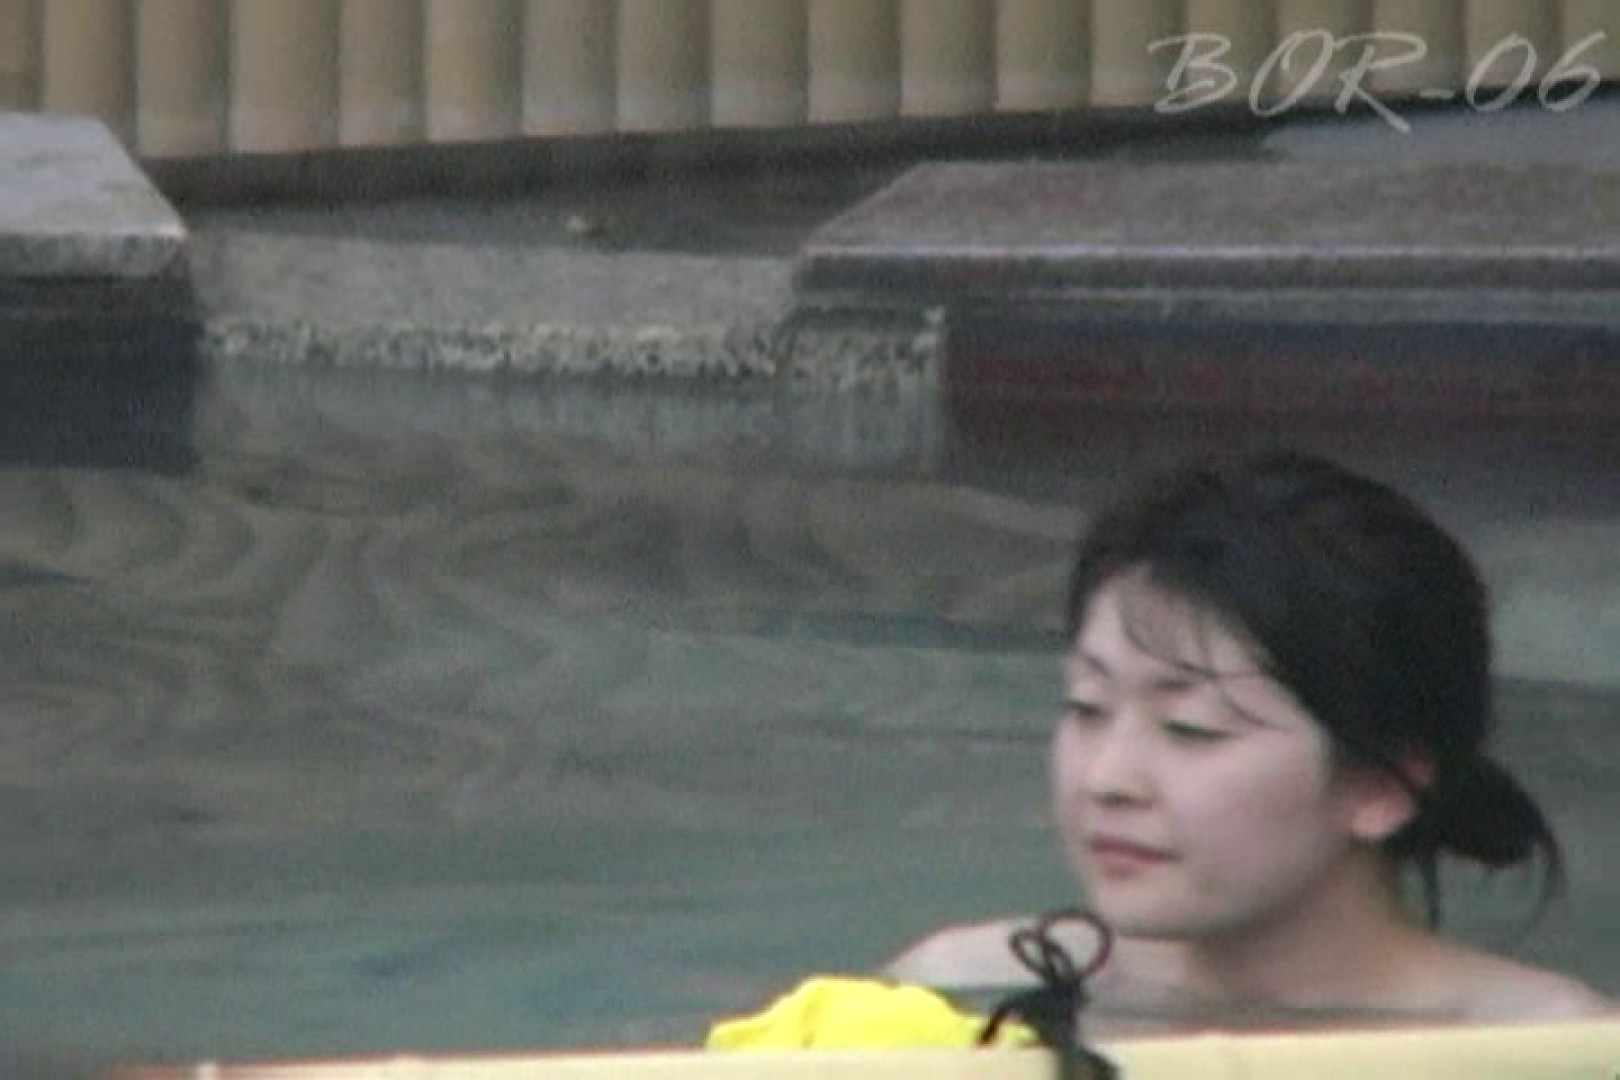 Aquaな露天風呂Vol.523 盗撮映像  93Pix 72